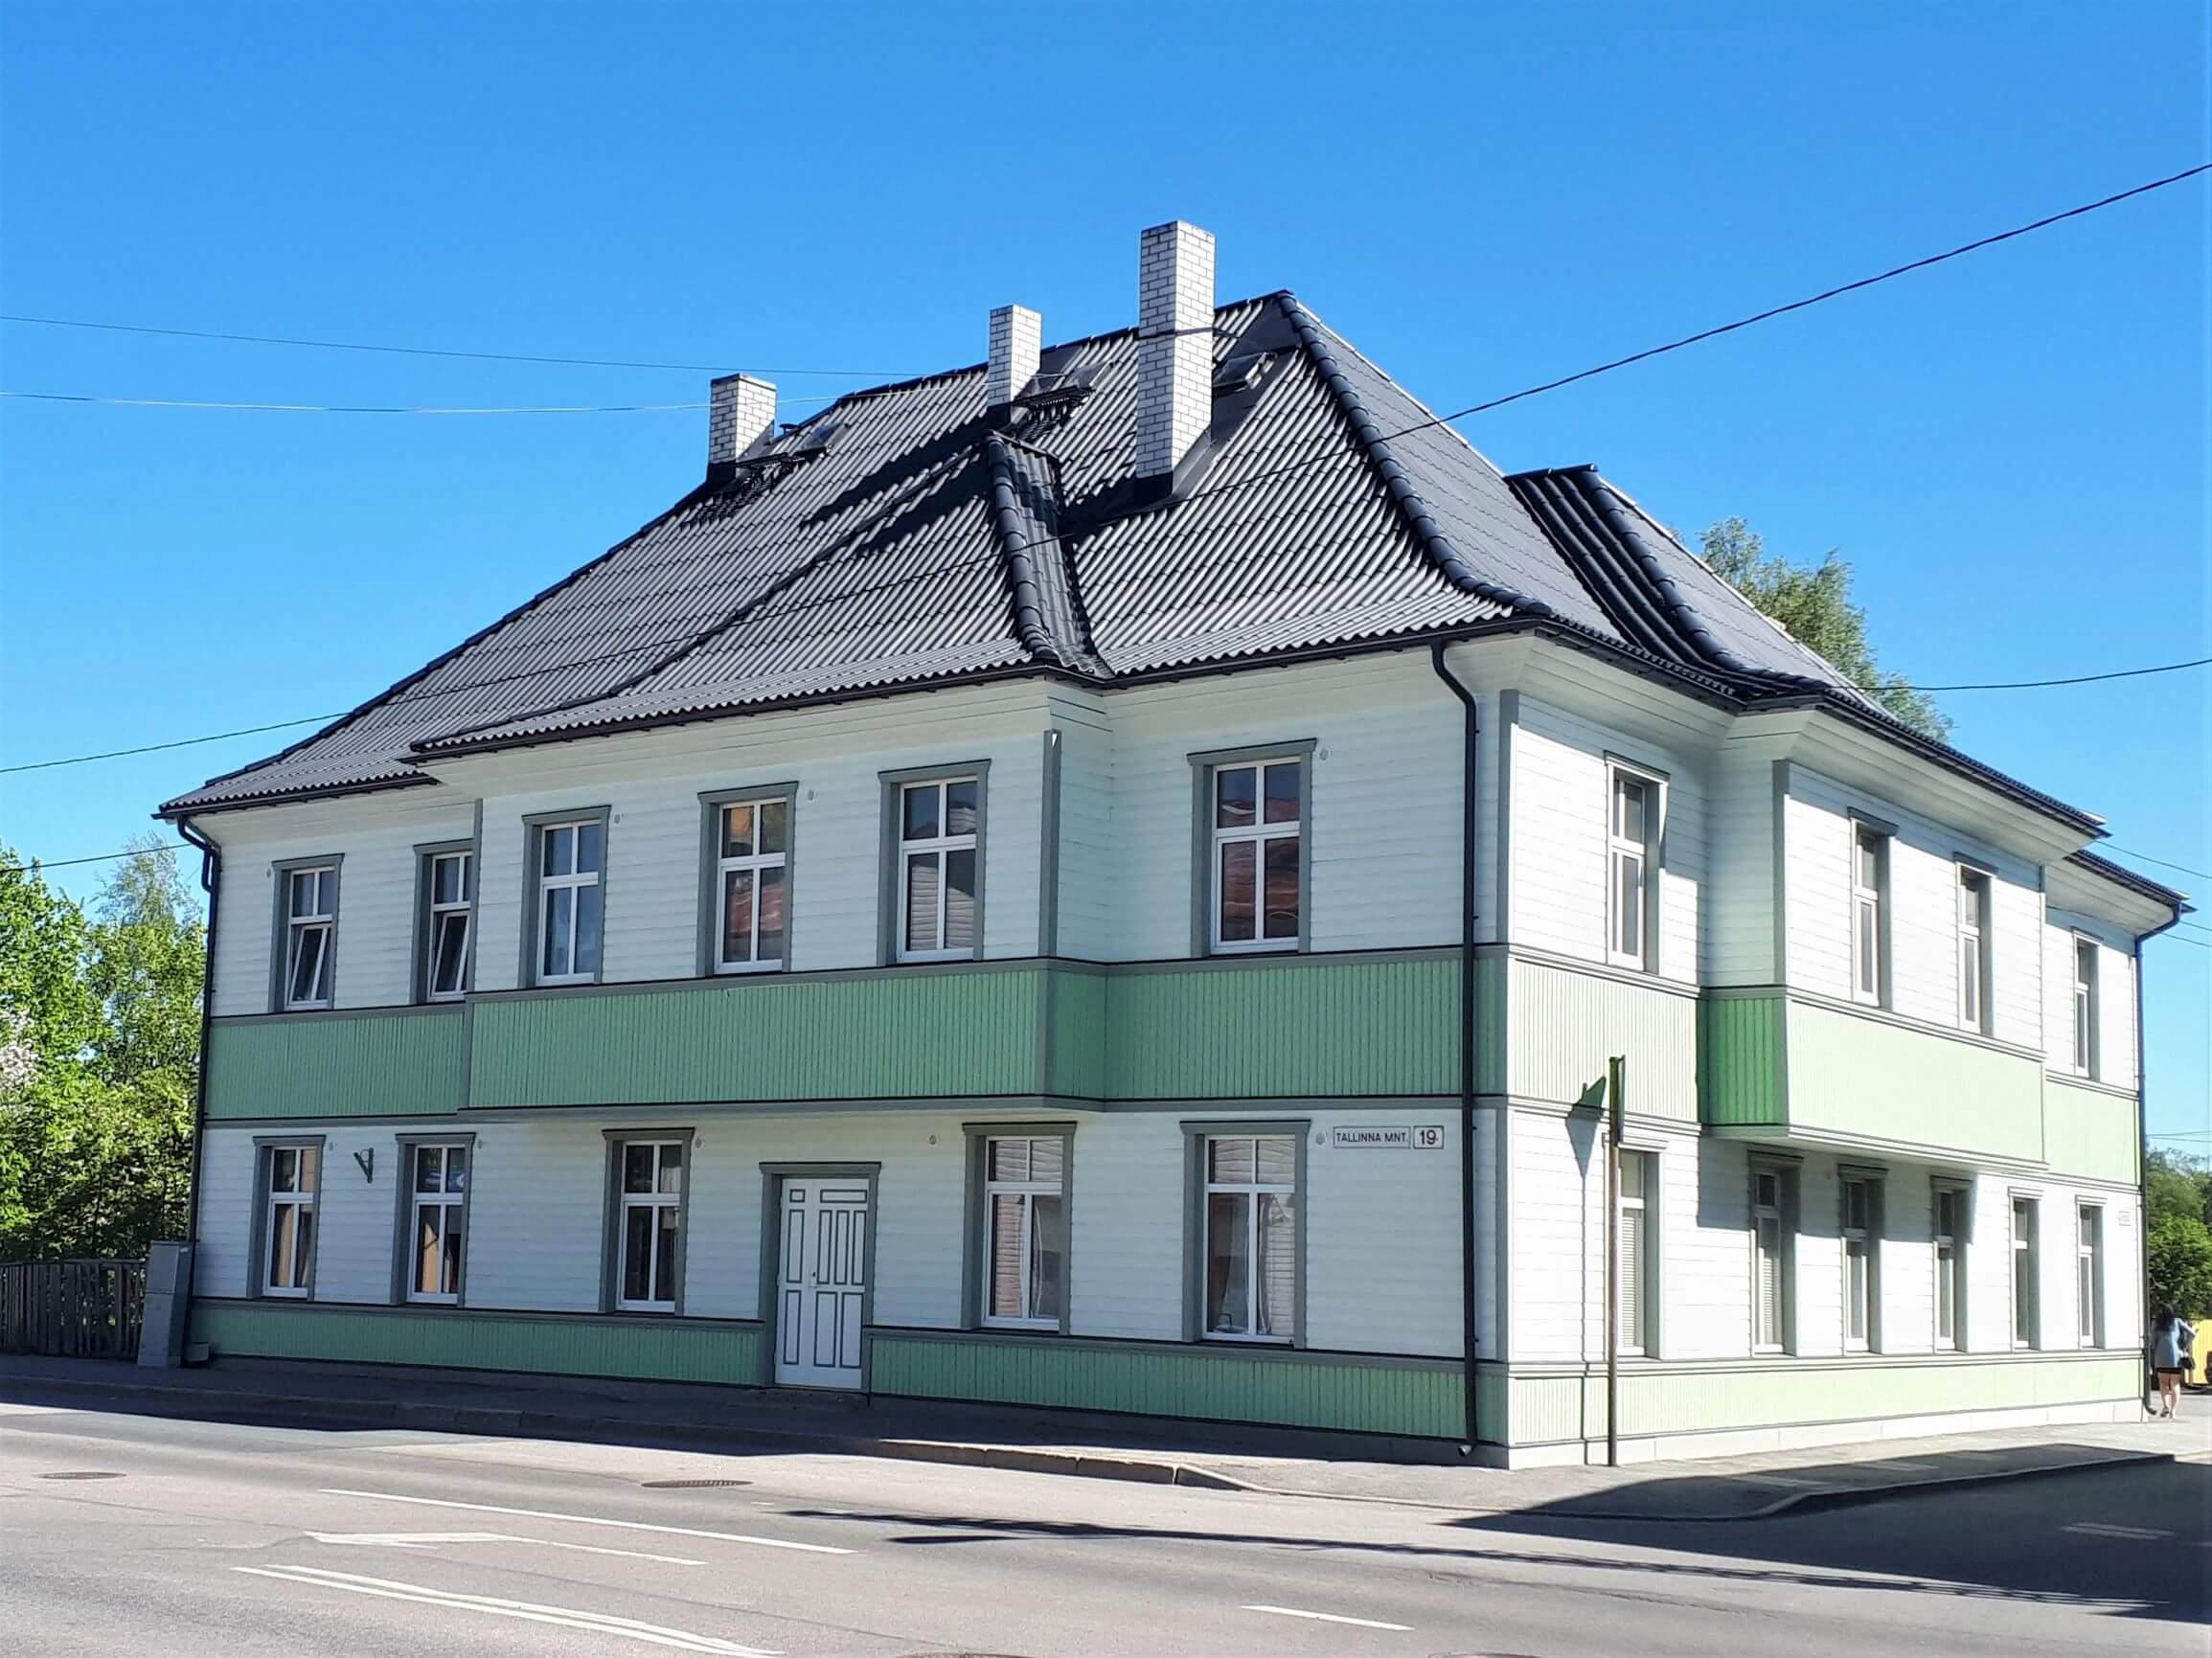 tallinna mnt 19, Pärnu